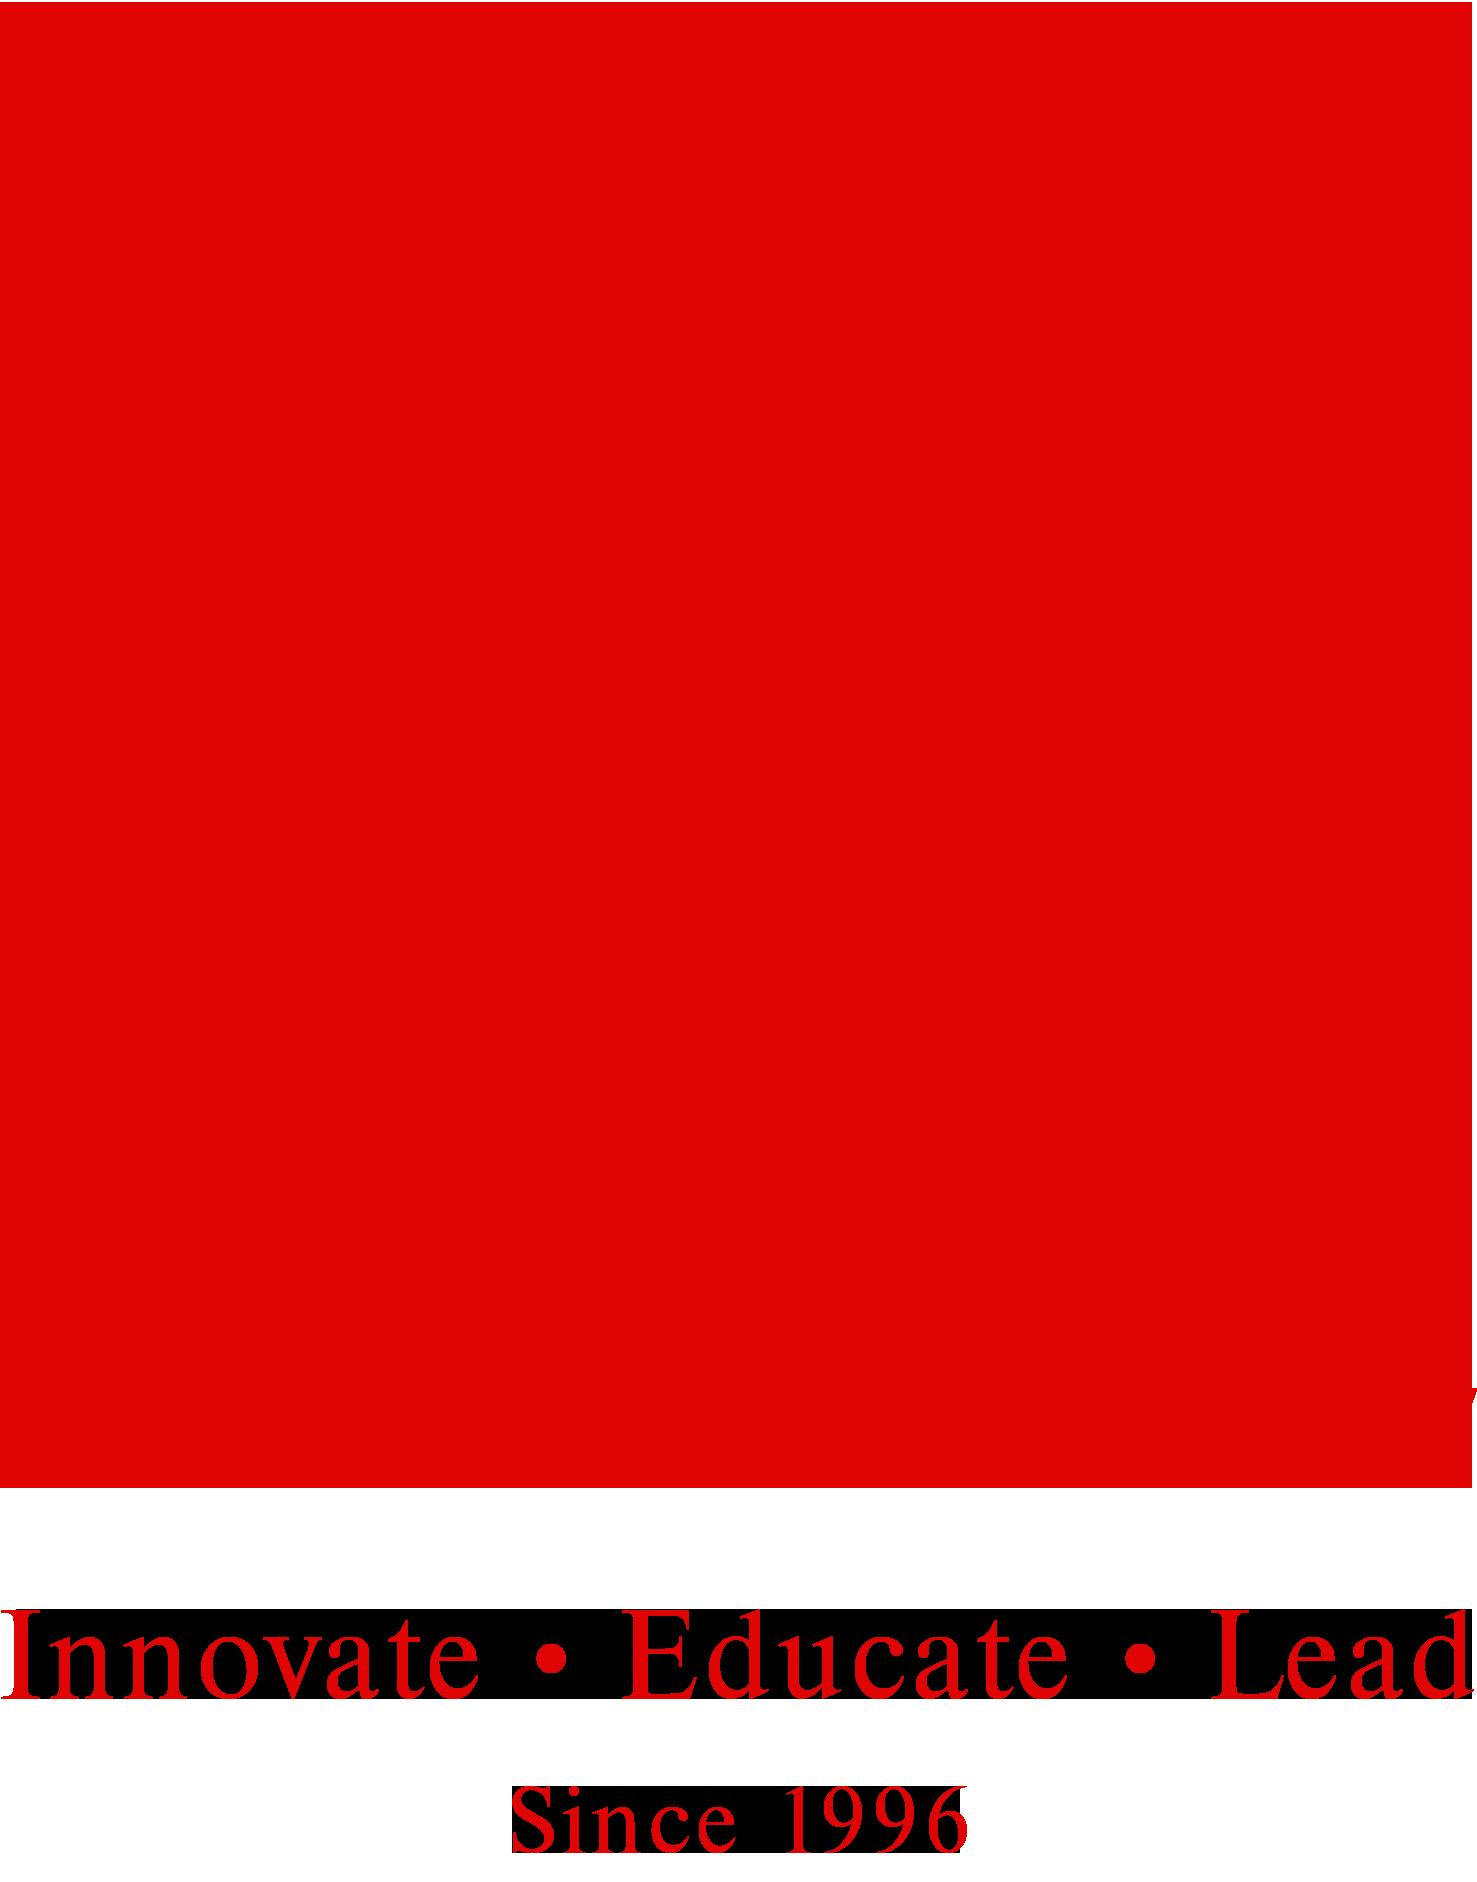 IIHE – Imperial Institute of Higher Educ